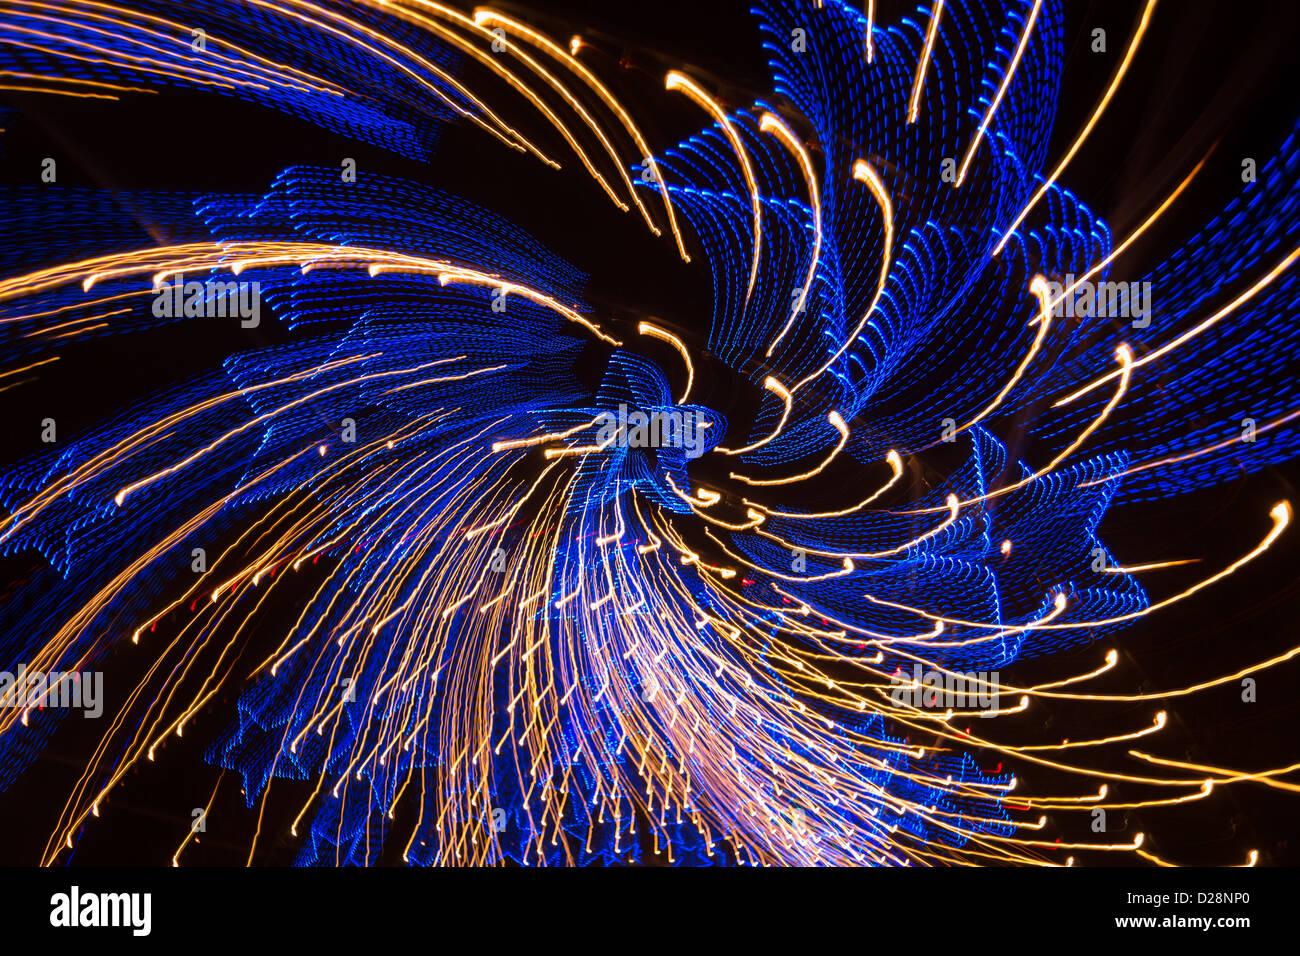 Austin Trail of Lights - blaue Sterne geformt Lichter Spin Muster Stockbild